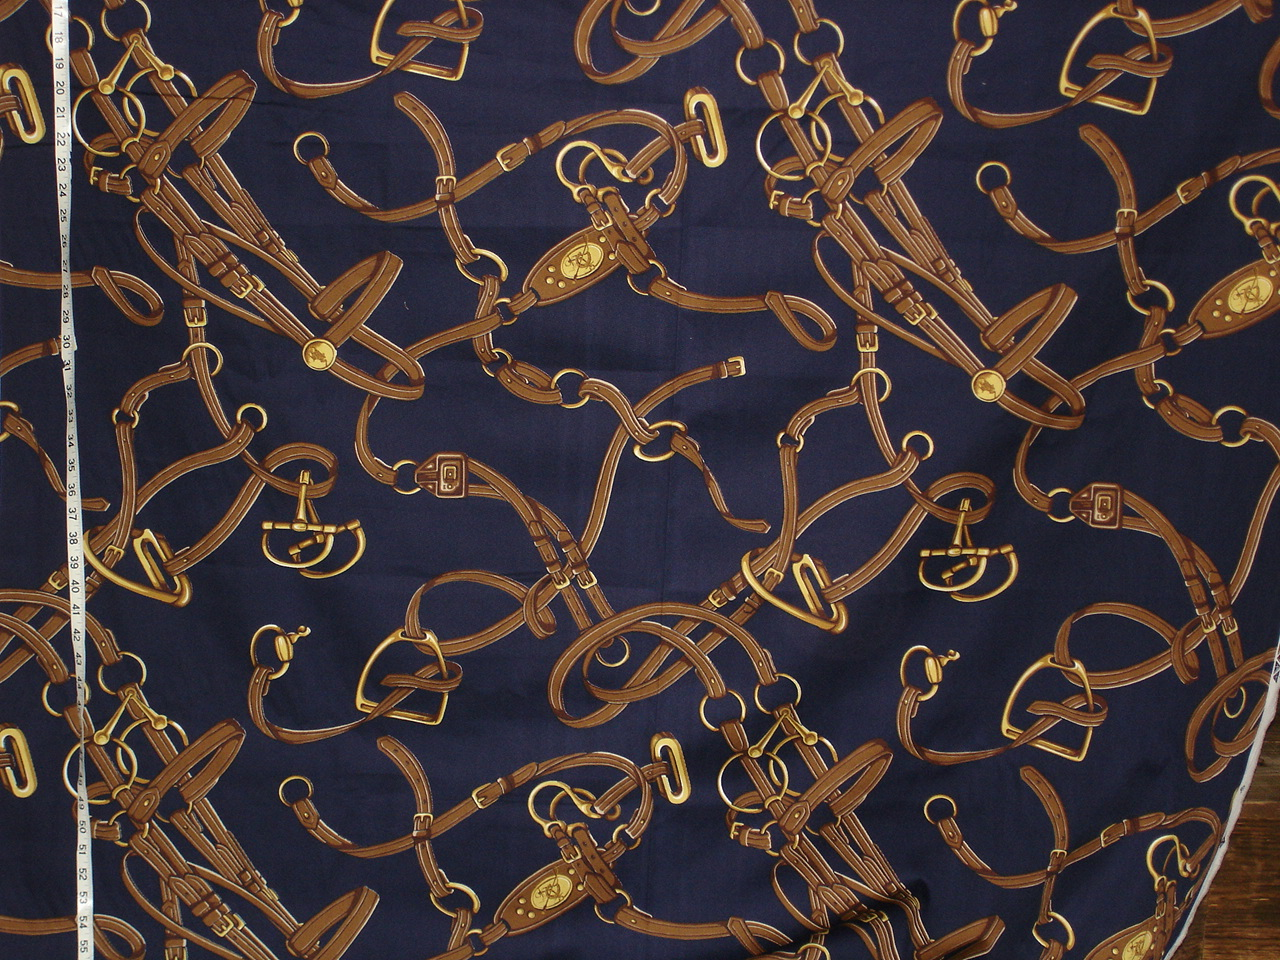 Fall Wallpaper Horses Equestrian Fabrics Horse Fabric Brickhouse Fabrics